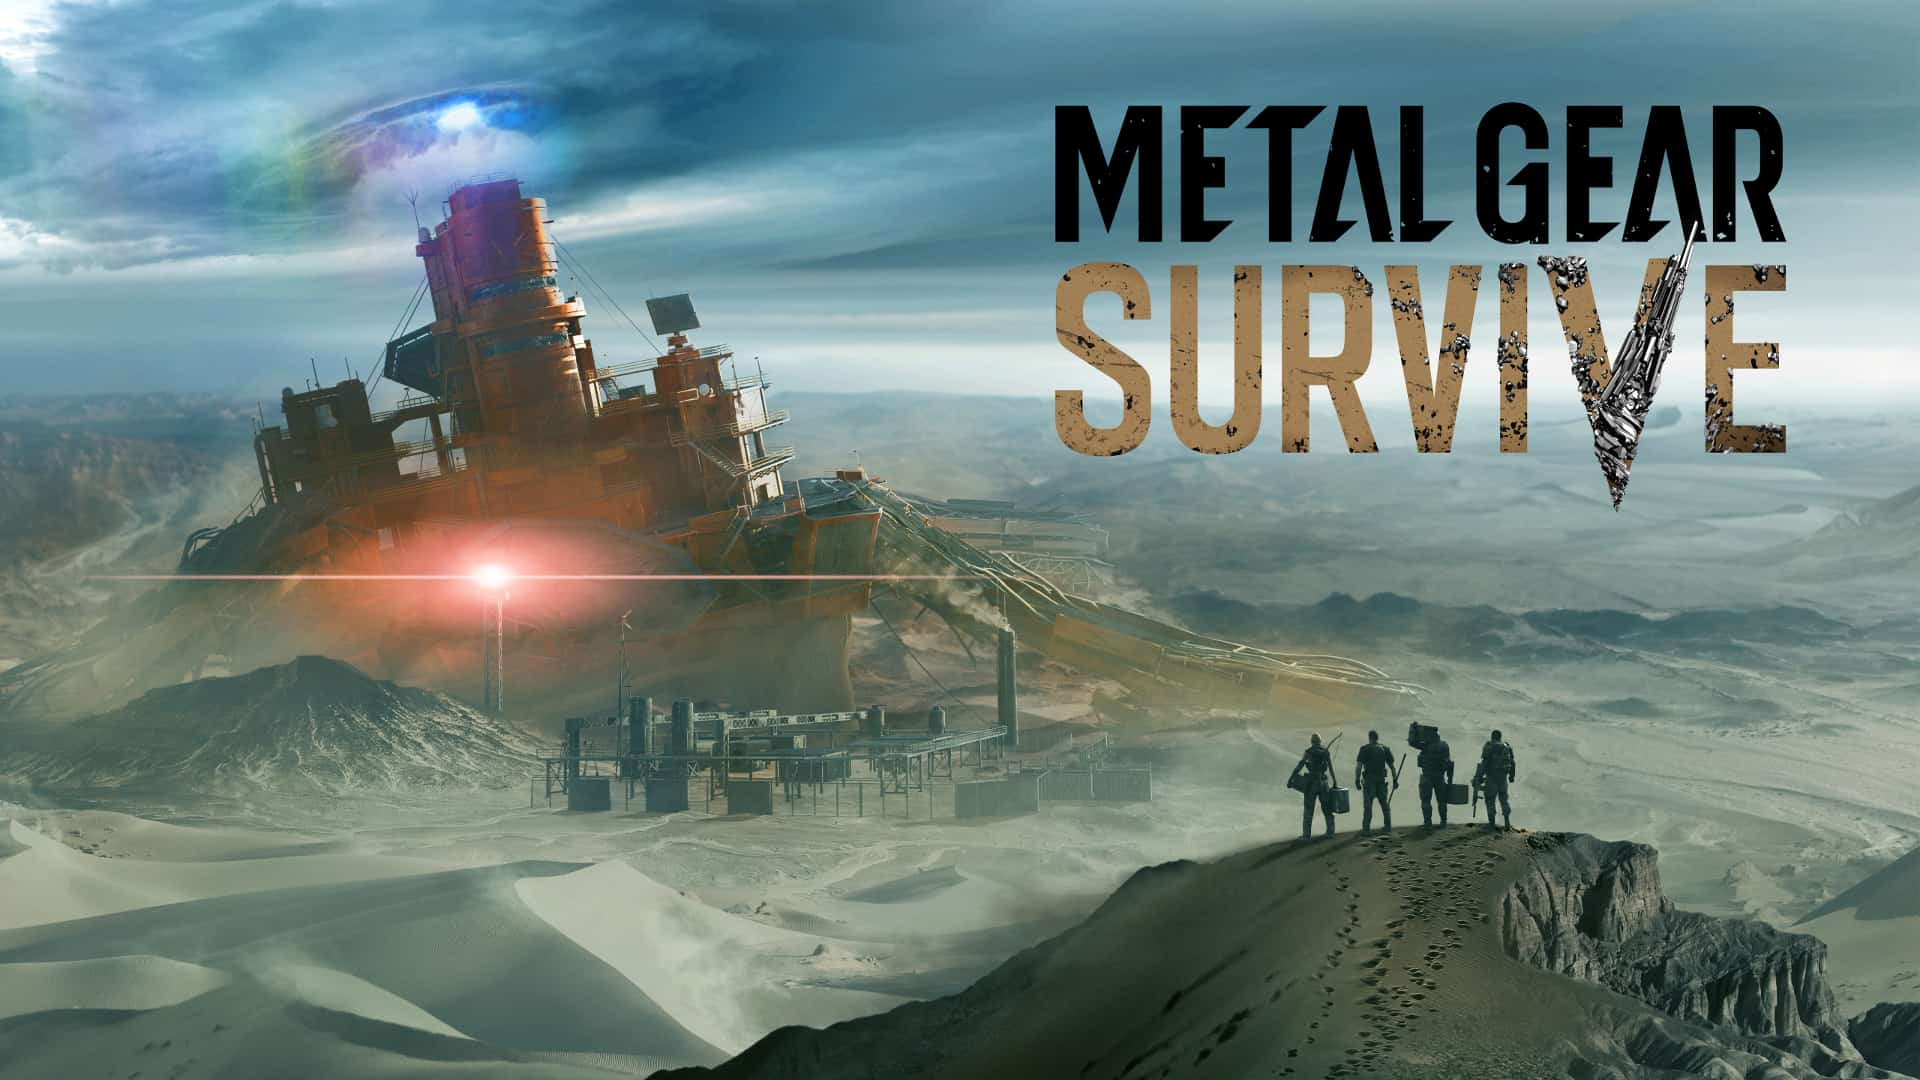 Metal Gear Survive immagine in evidenza